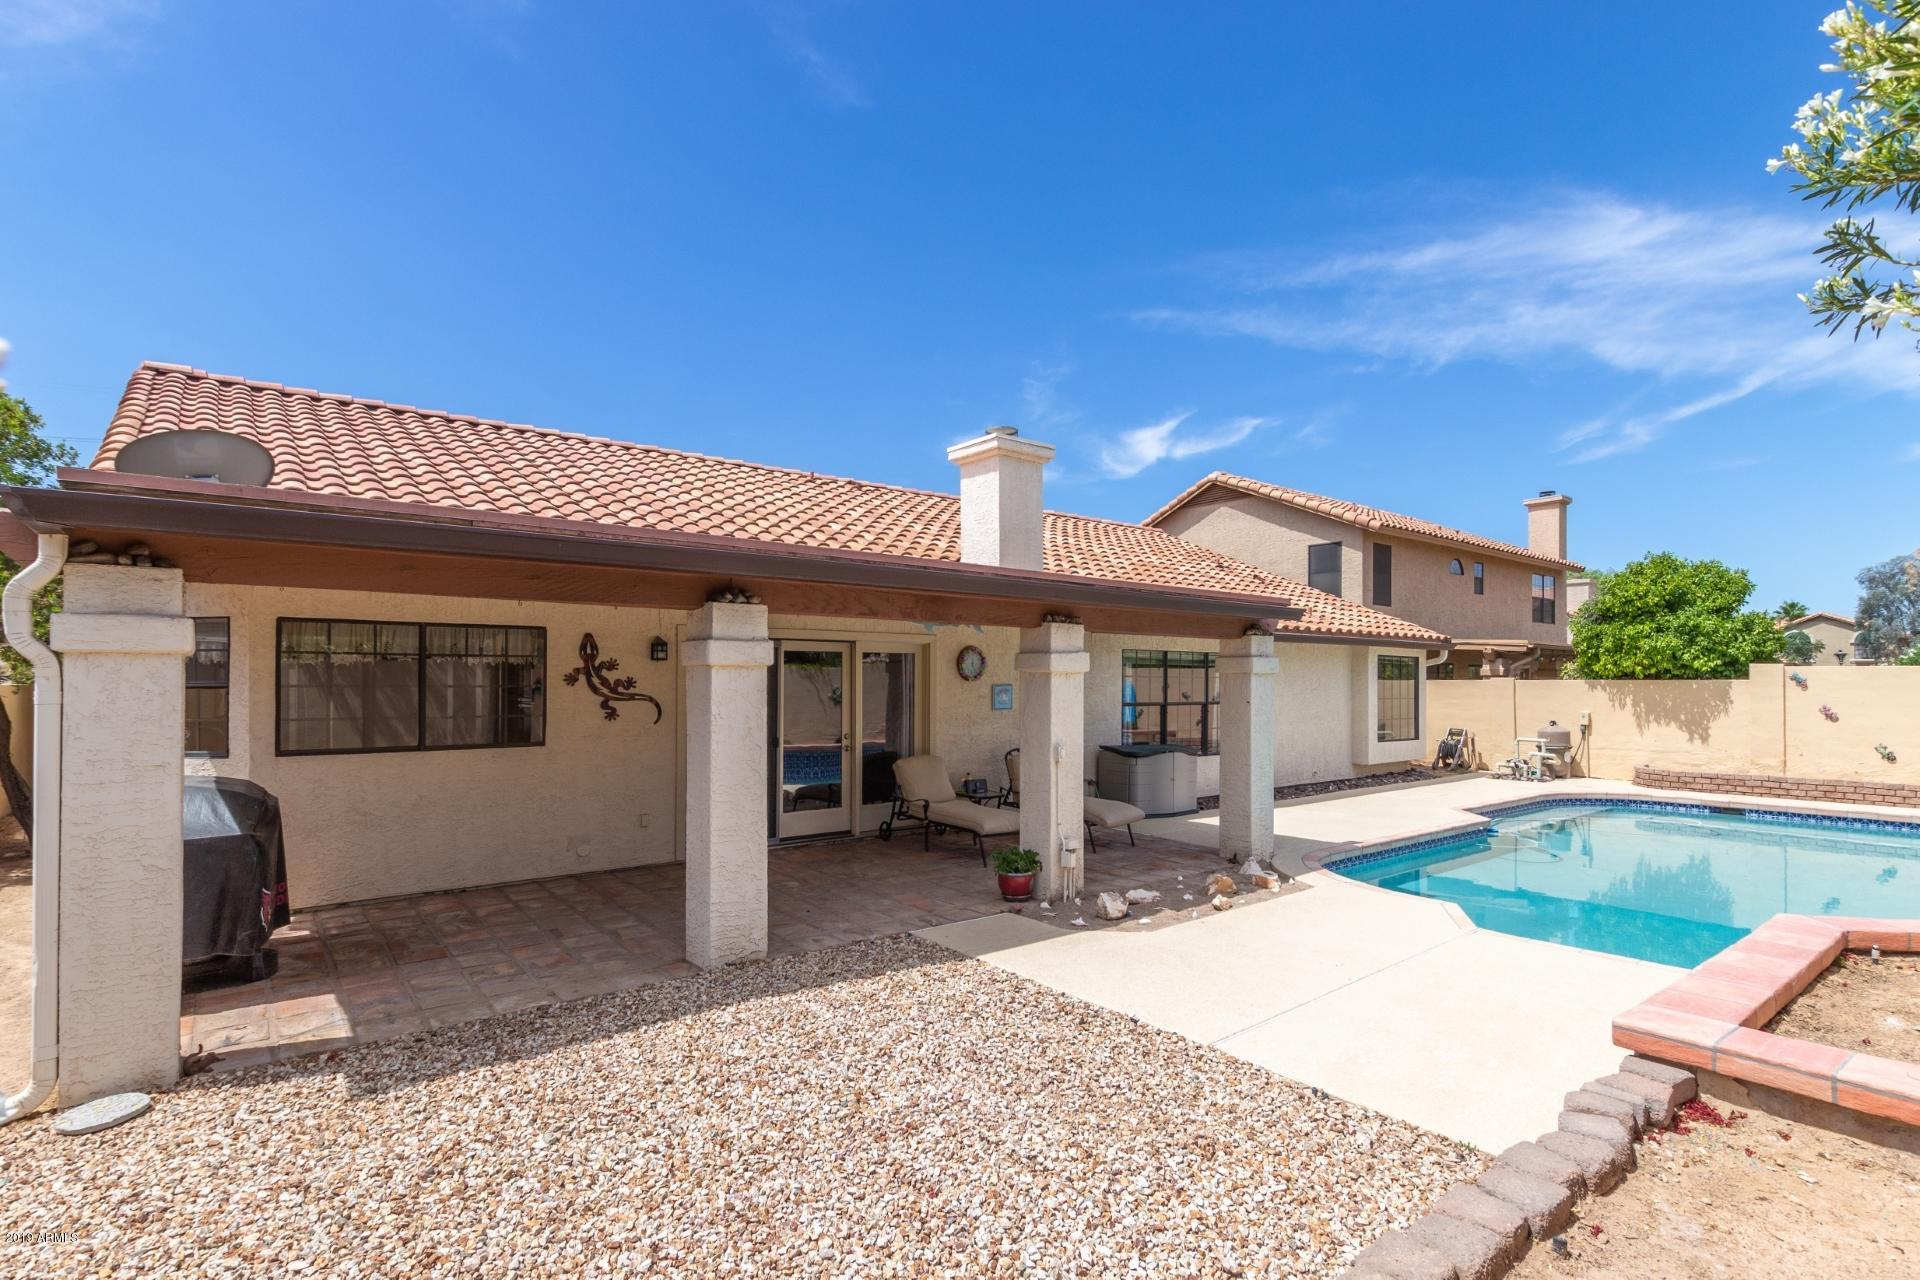 MLS 5939728 3244 E CEDARWOOD Lane, Phoenix, AZ 85048 Ahwatukee Community AZ Condo or Townhome